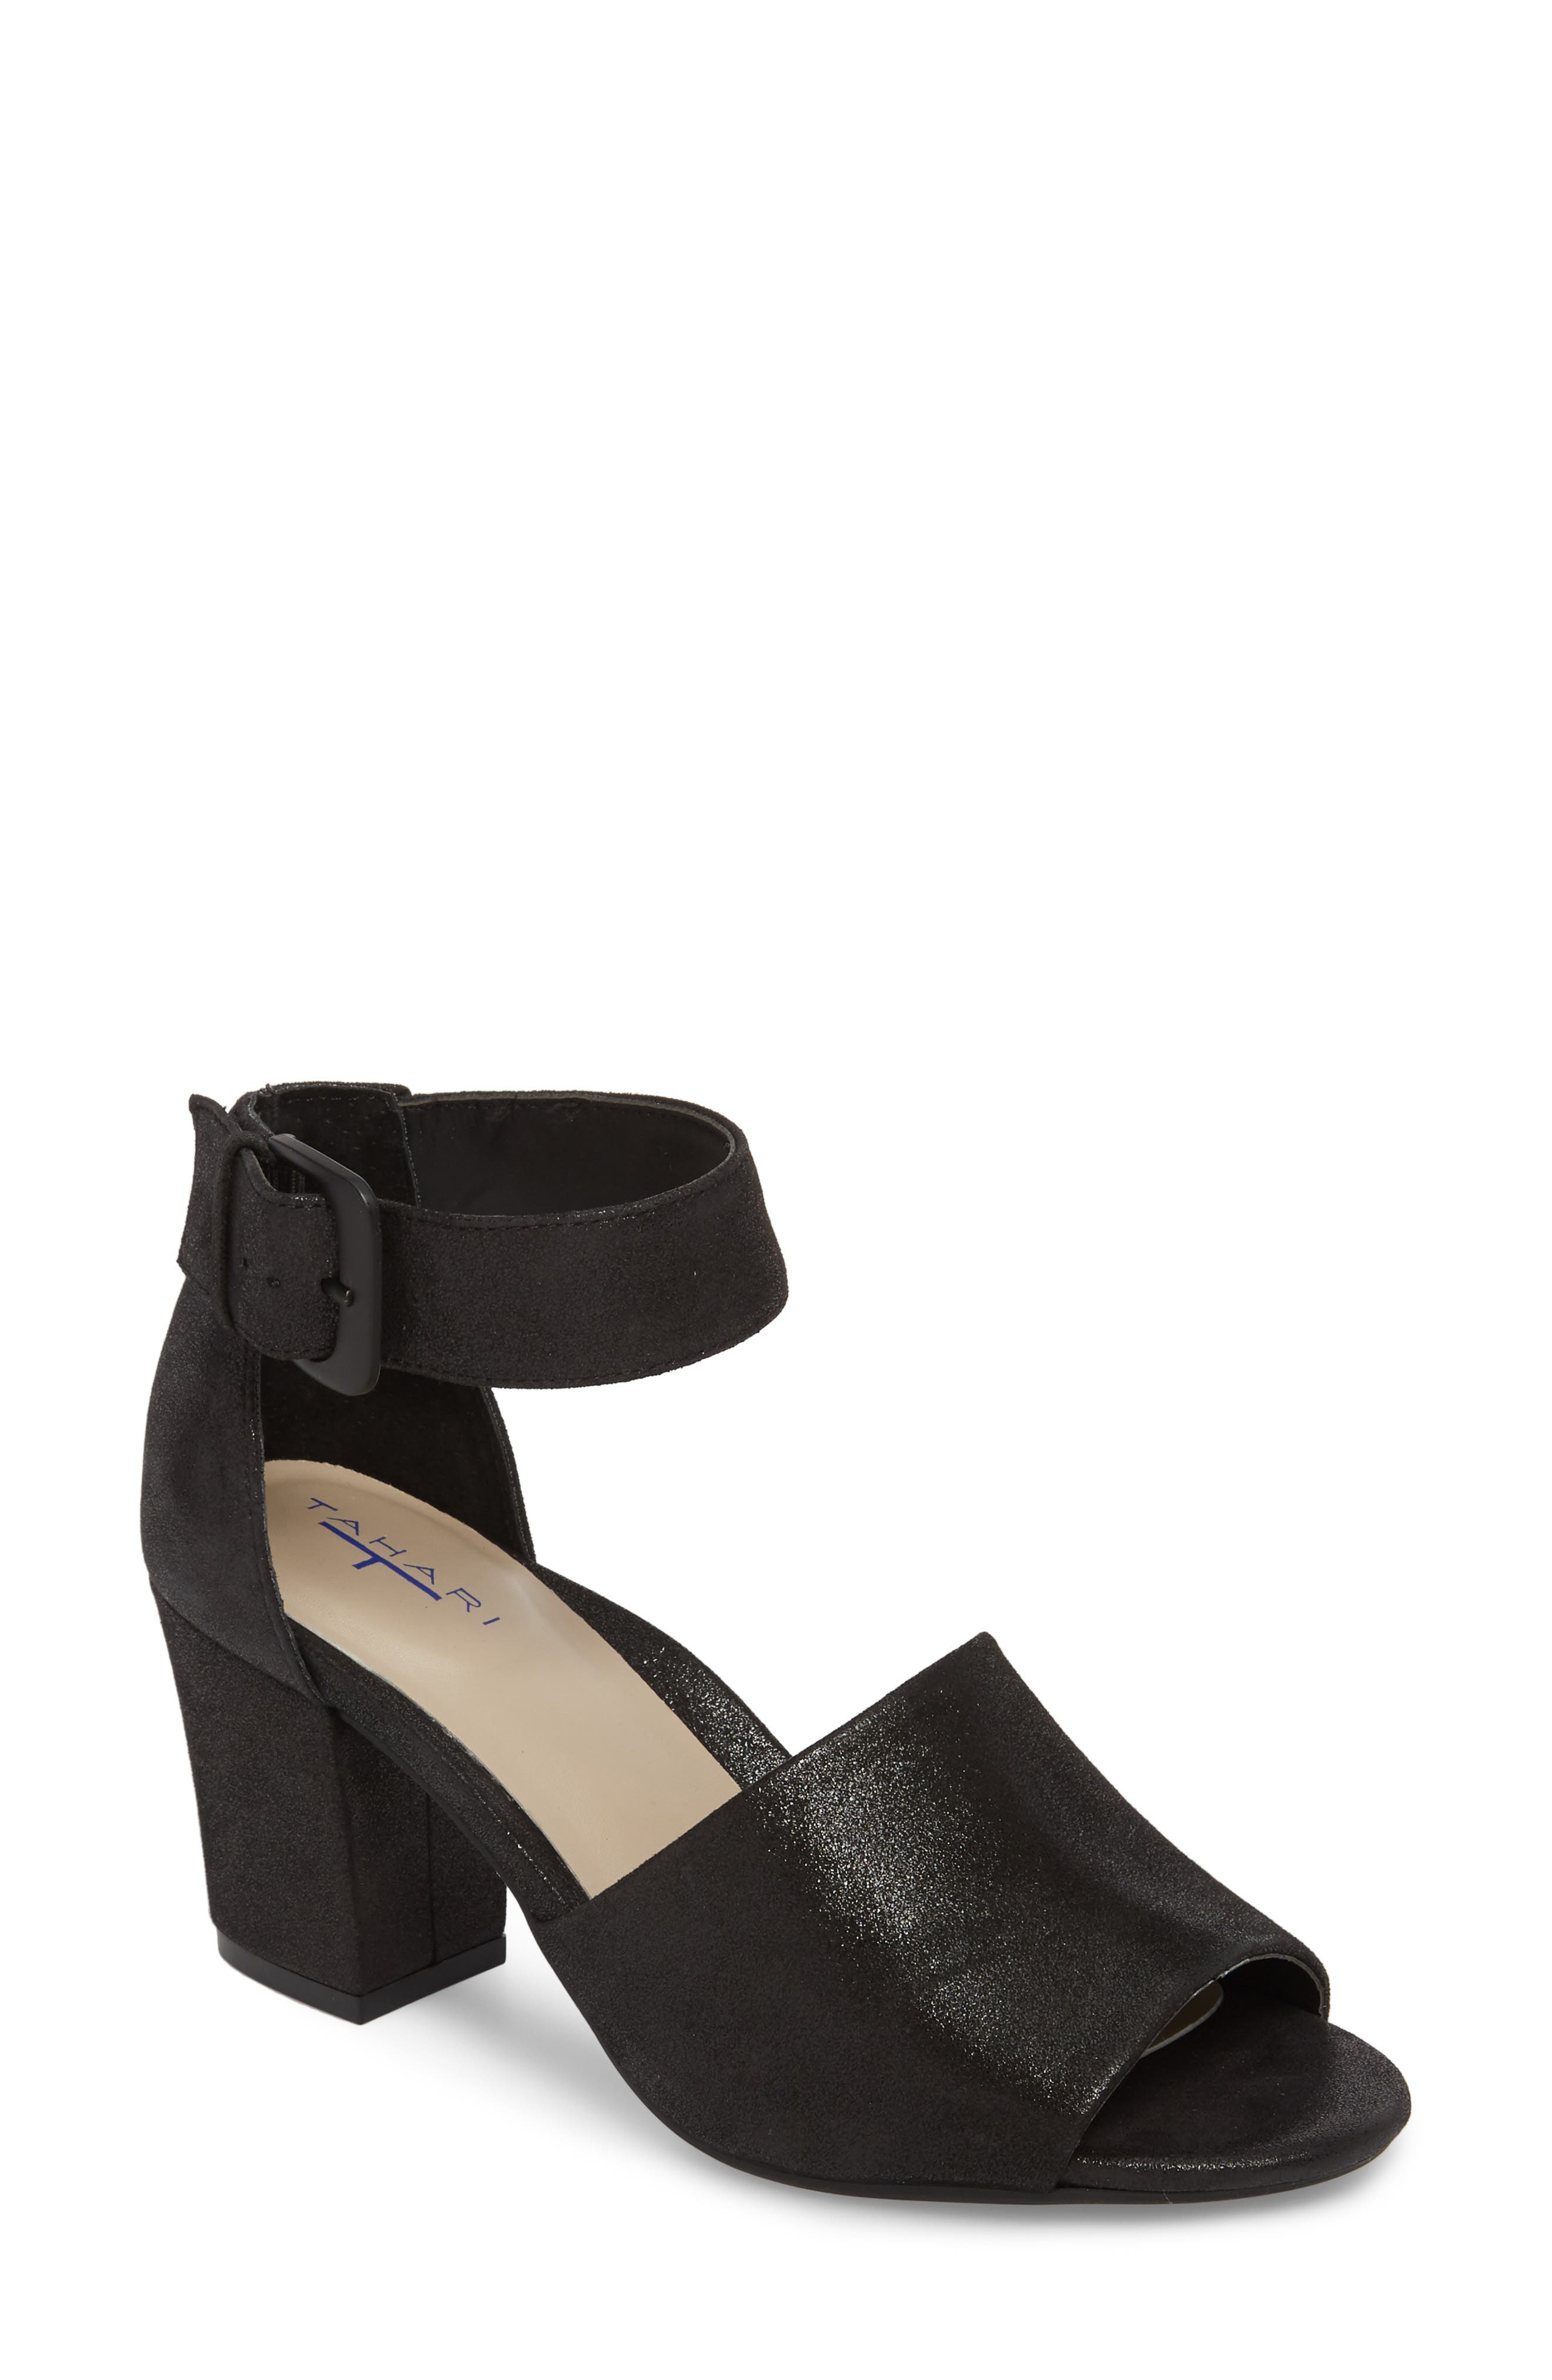 Piper Sandal,                         Main,                         color, Black Suede